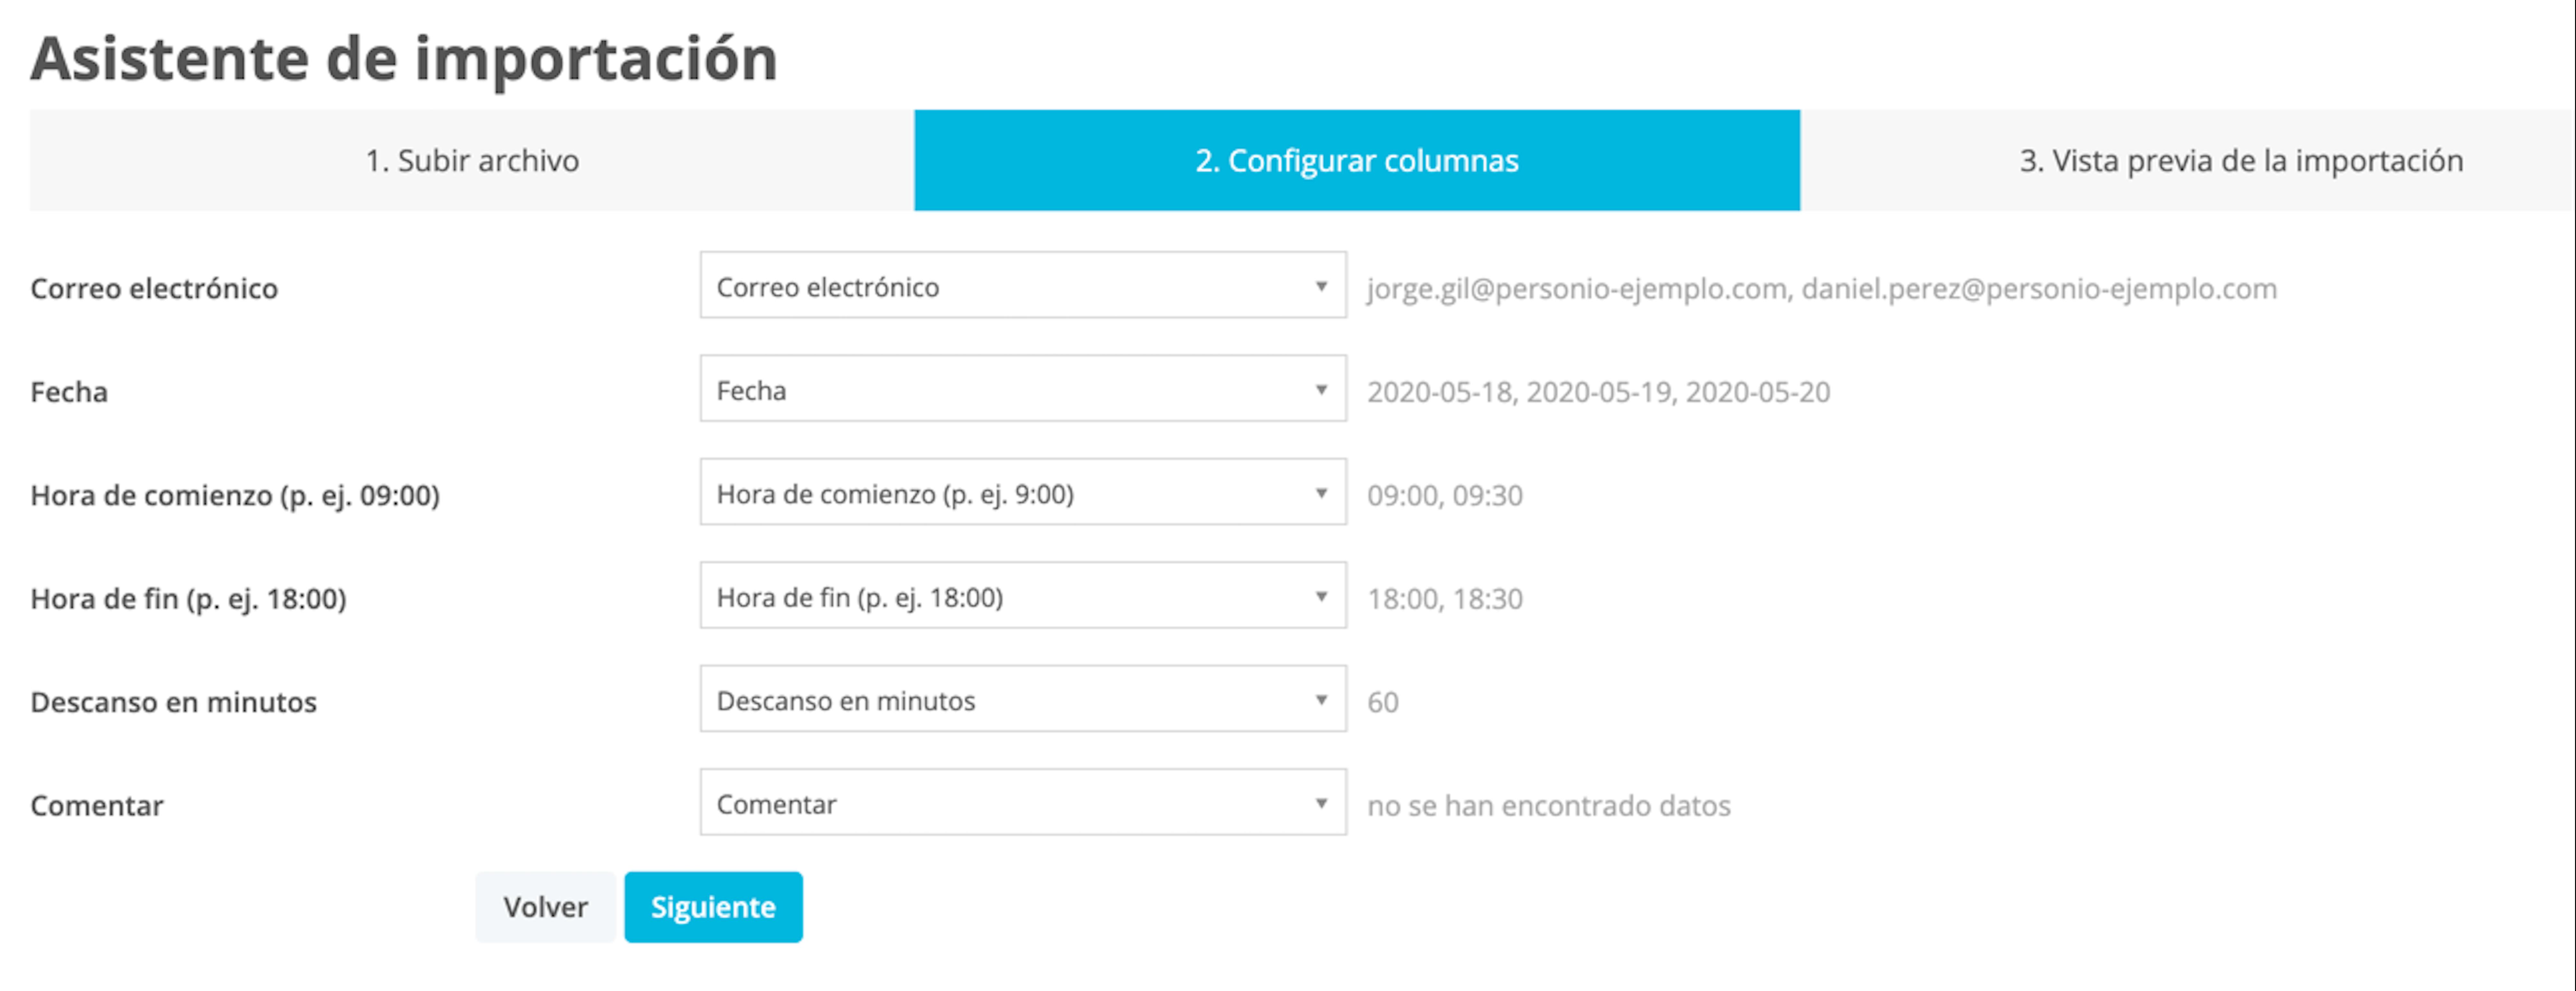 historical-attendances-assign-attributes_es.png